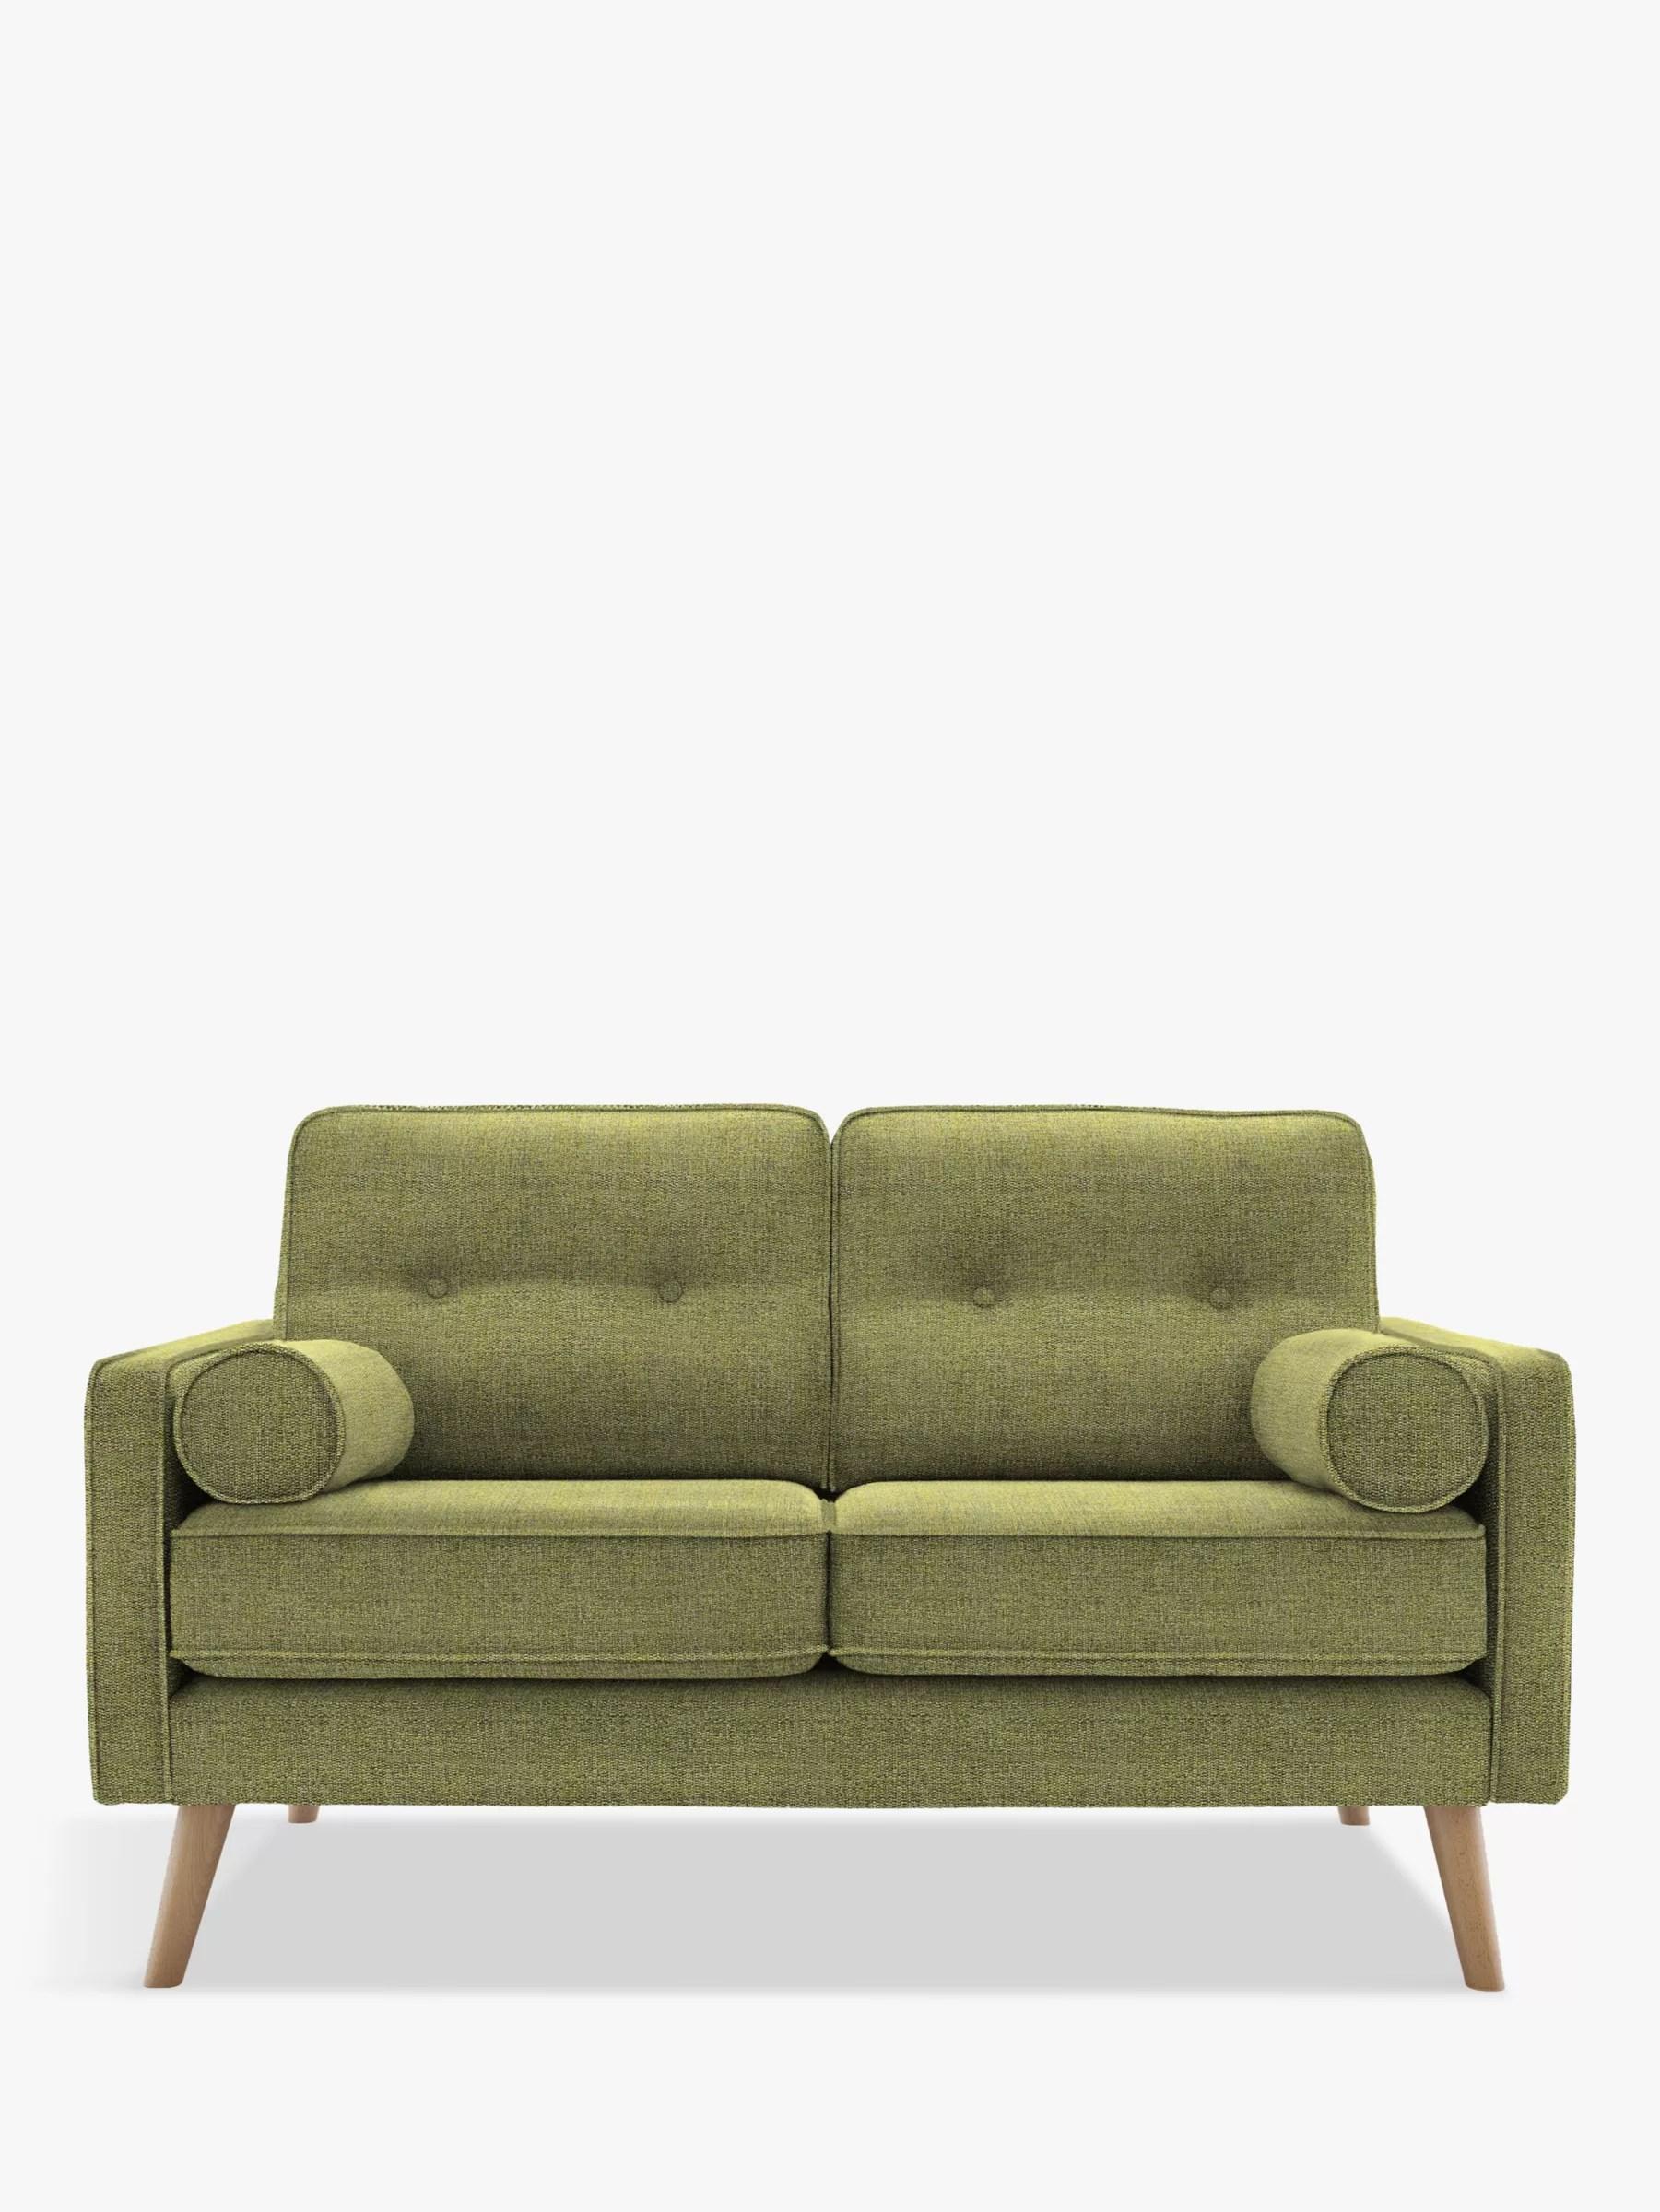 moss green velvet chesterfield sofa bad vintage catosfera